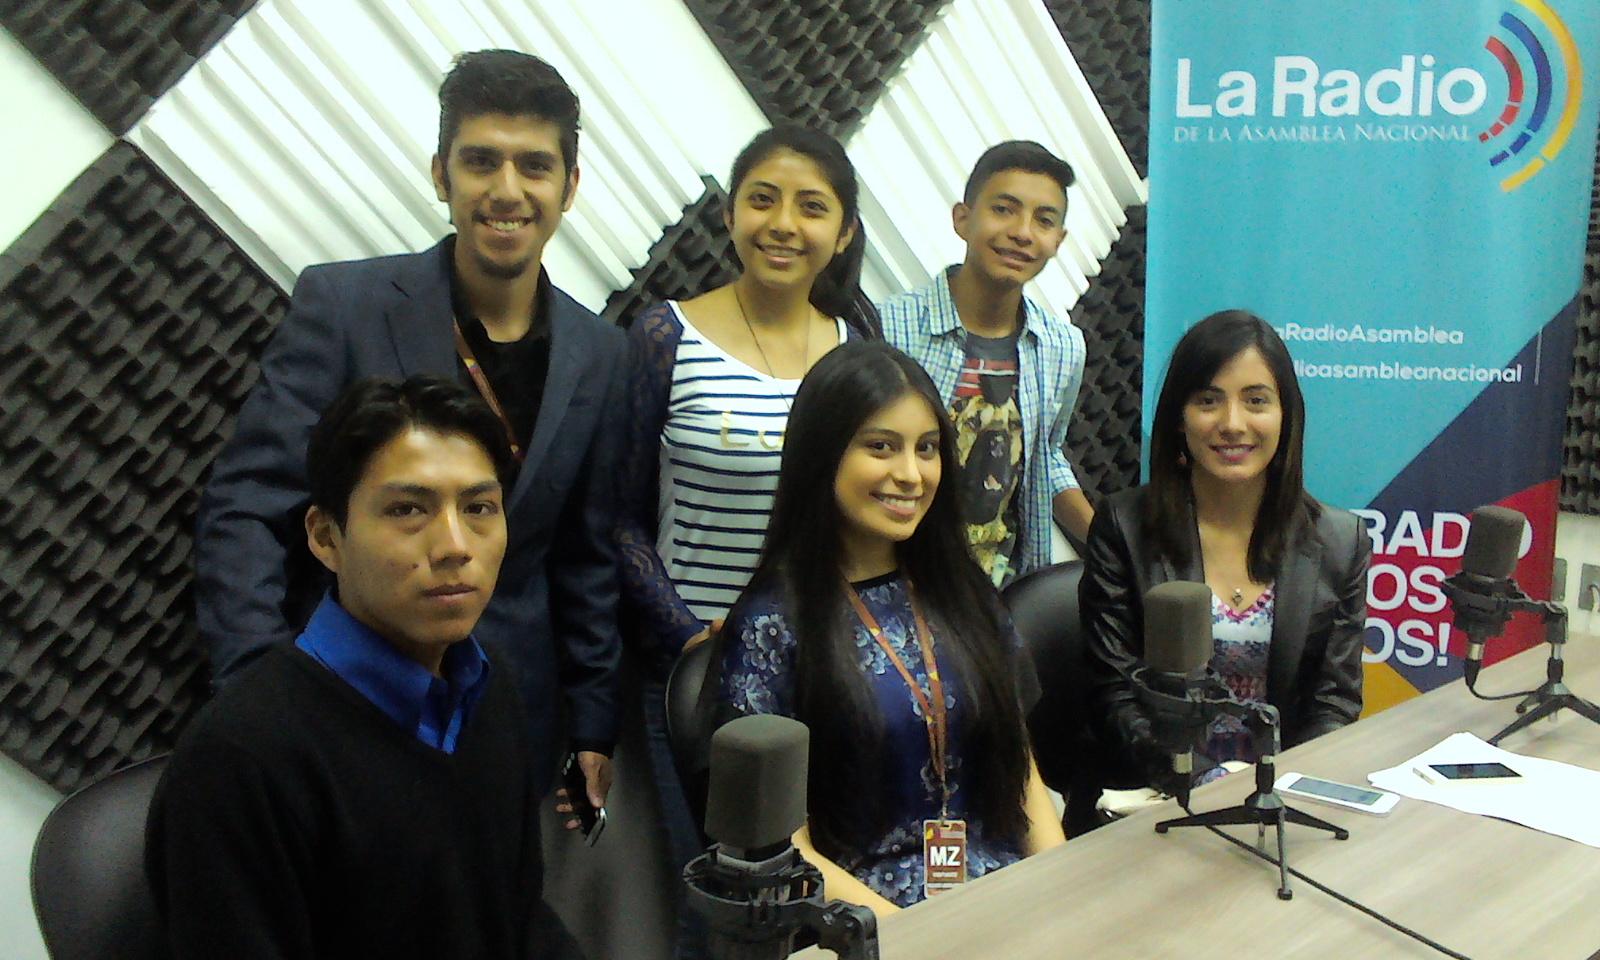 Participación Juvenil en Medios